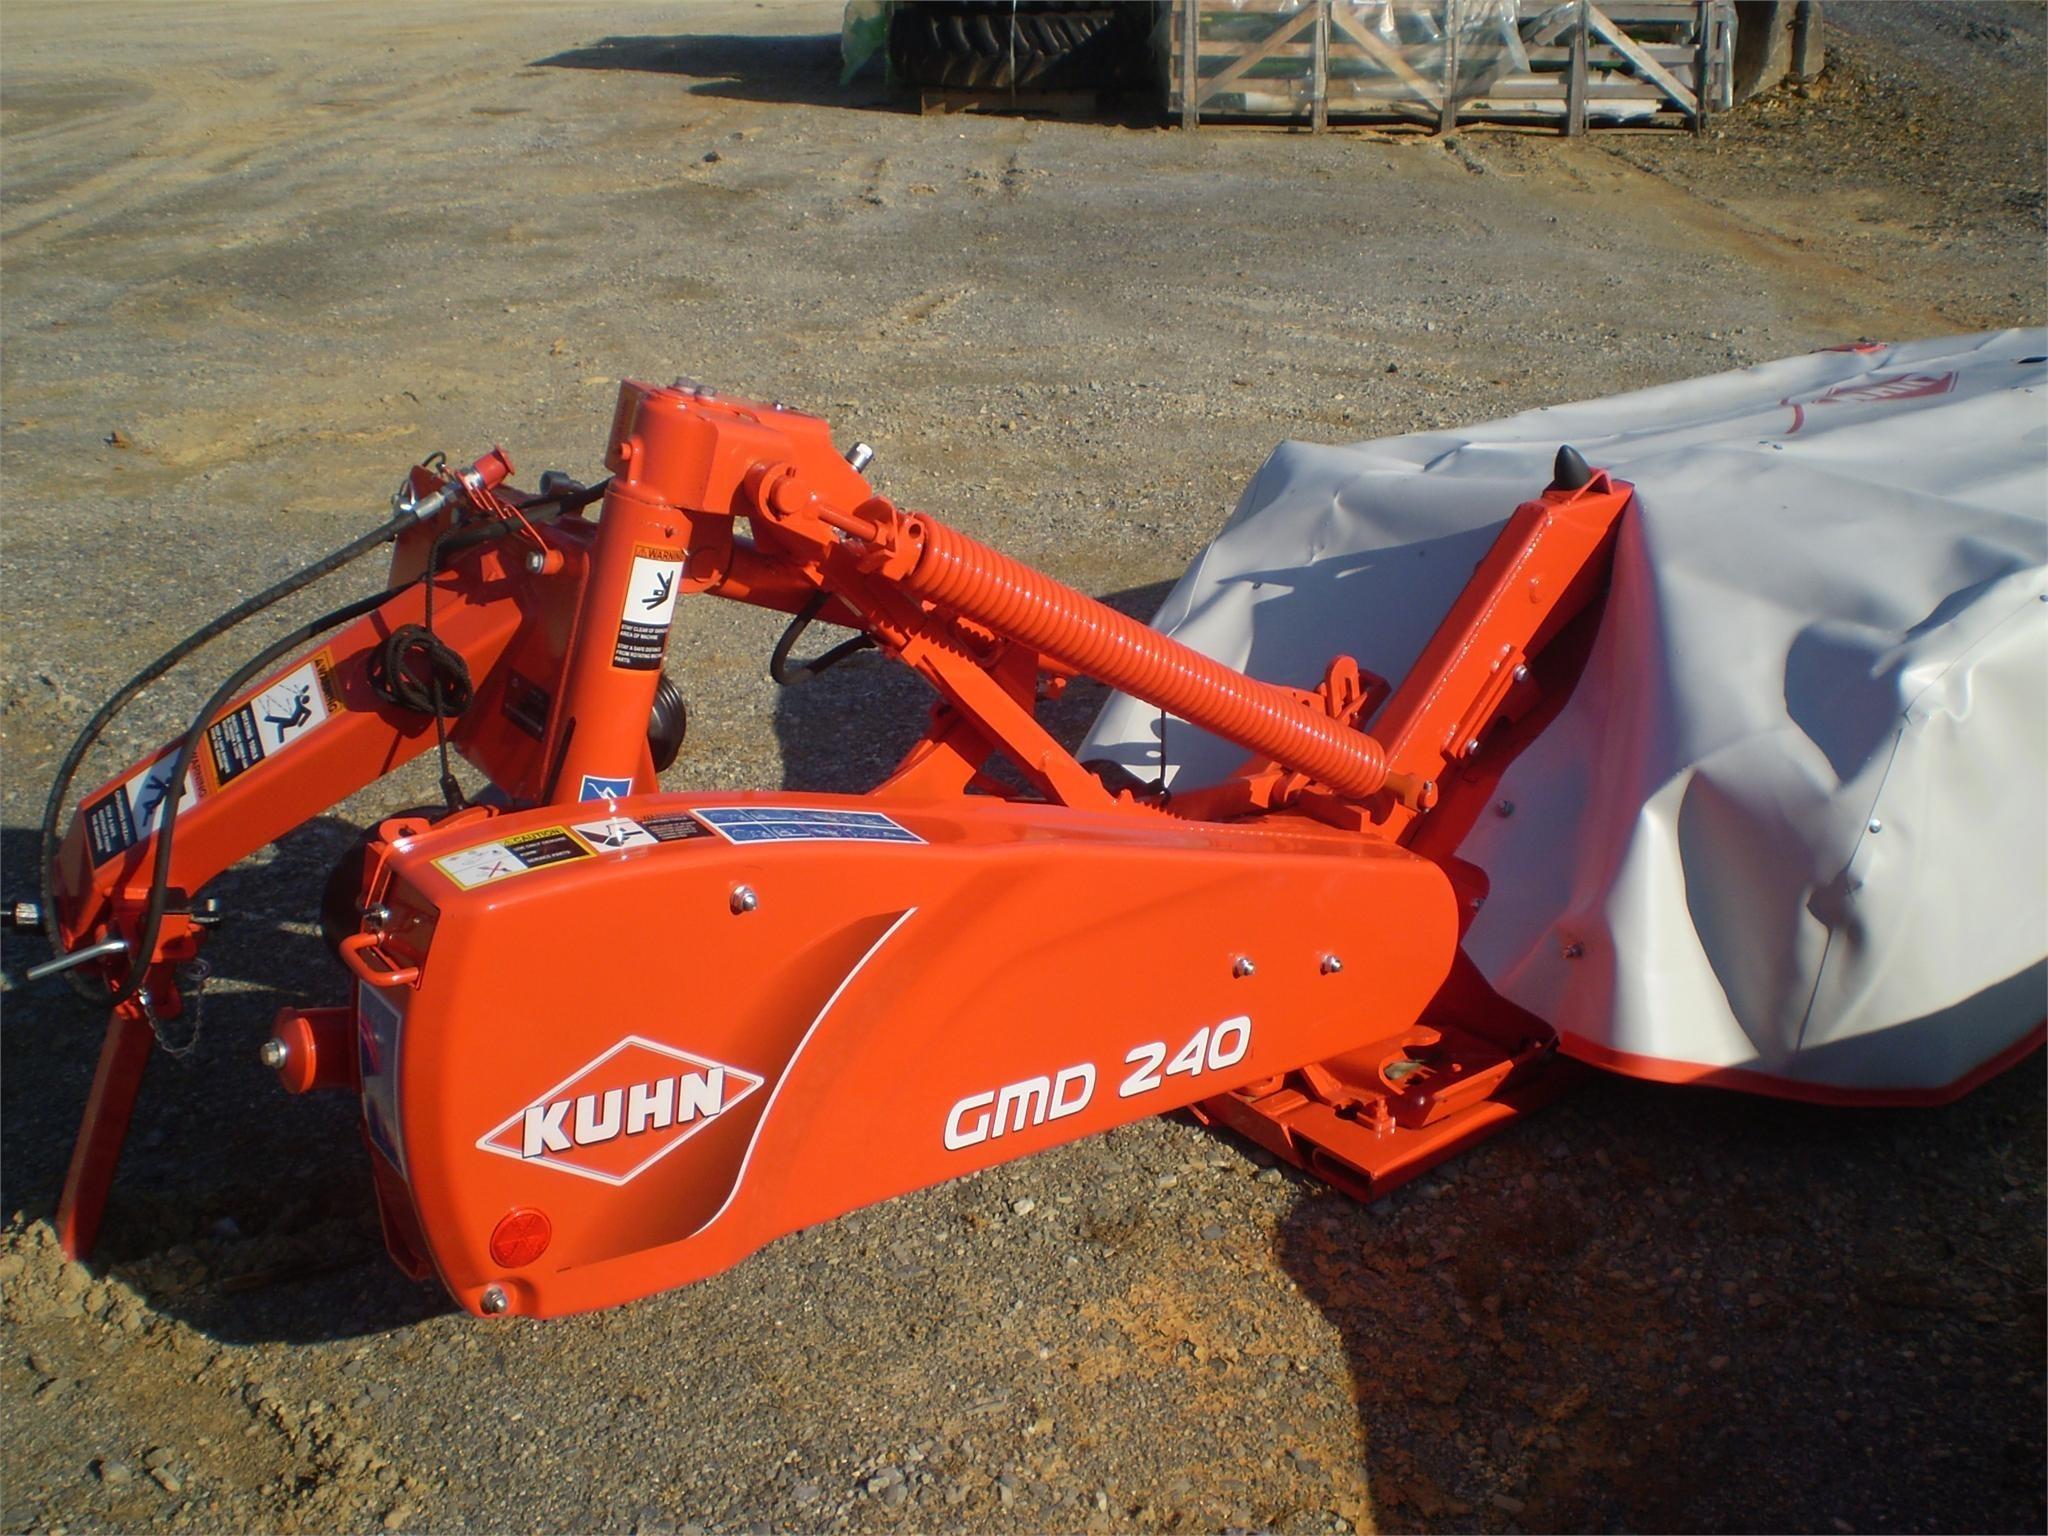 2020 Kuhn GMD240 Disk Mower